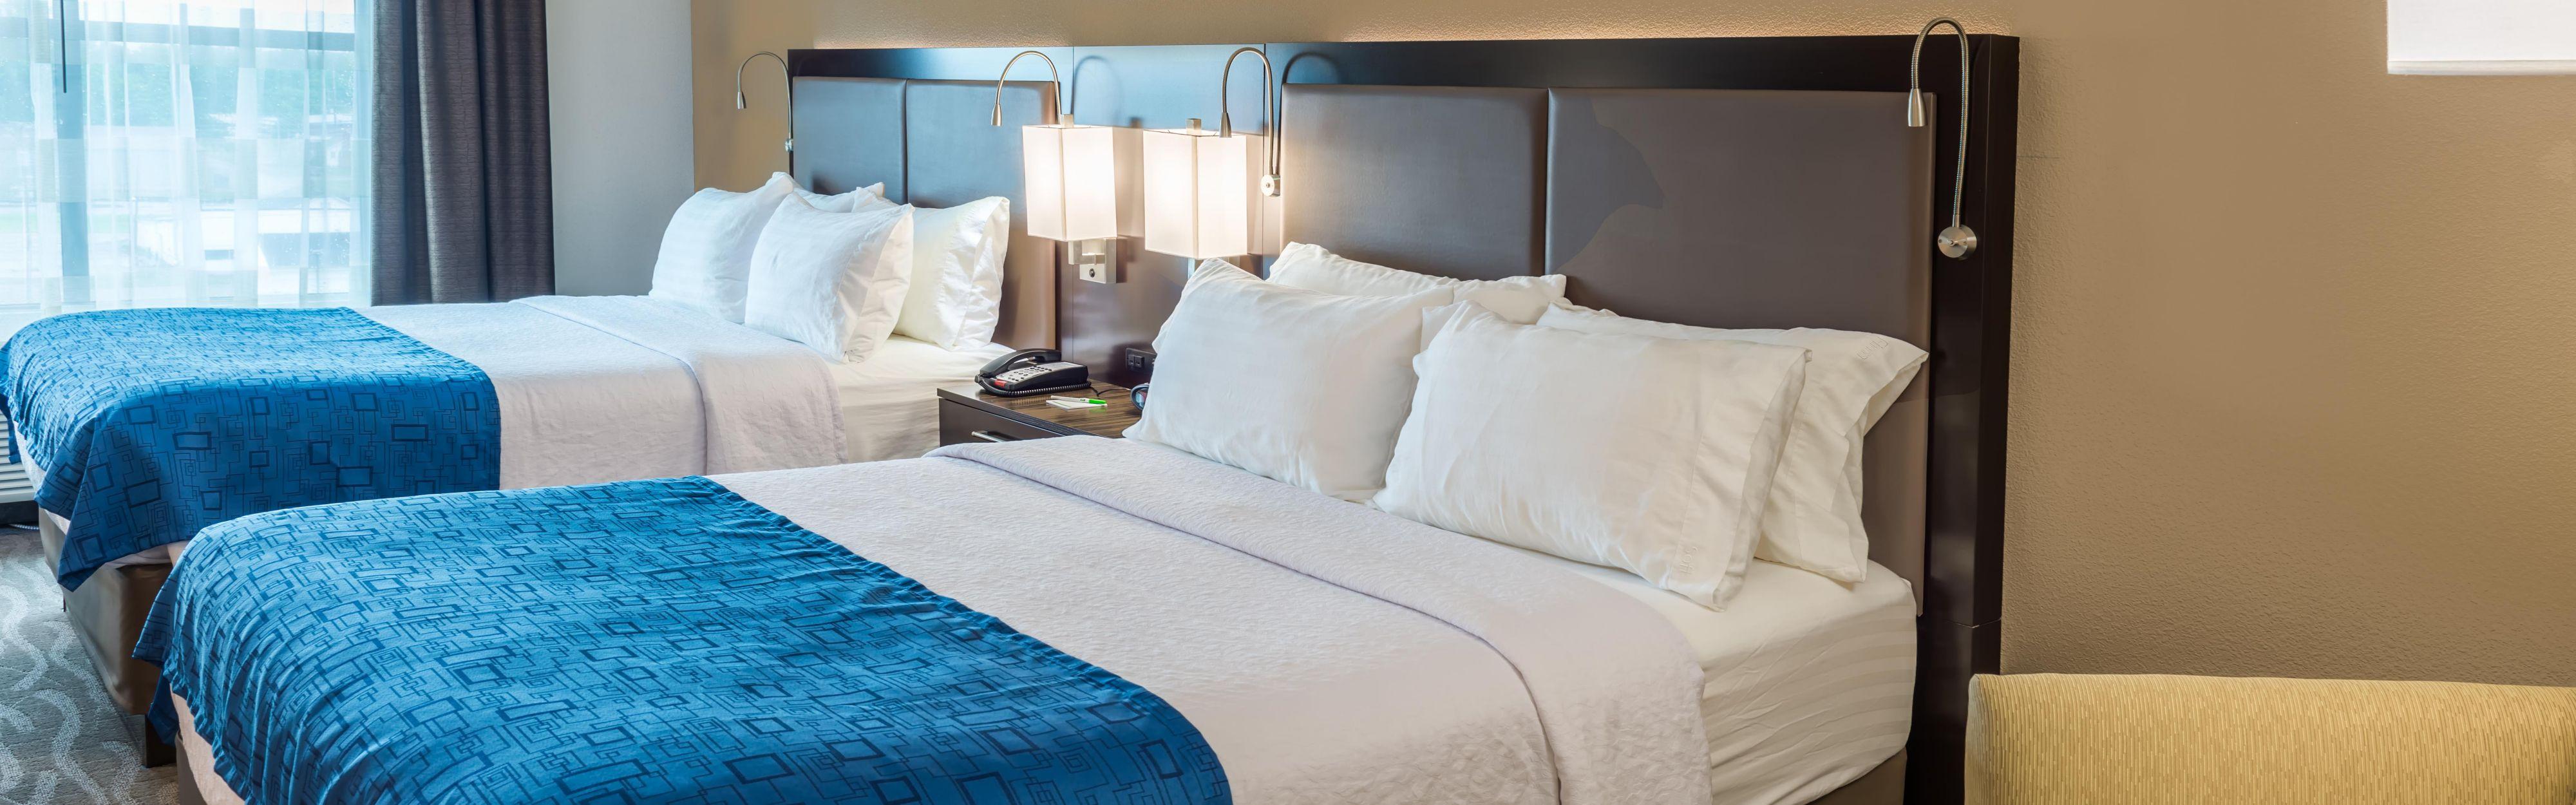 Holiday Inn Owensboro Riverfront image 1